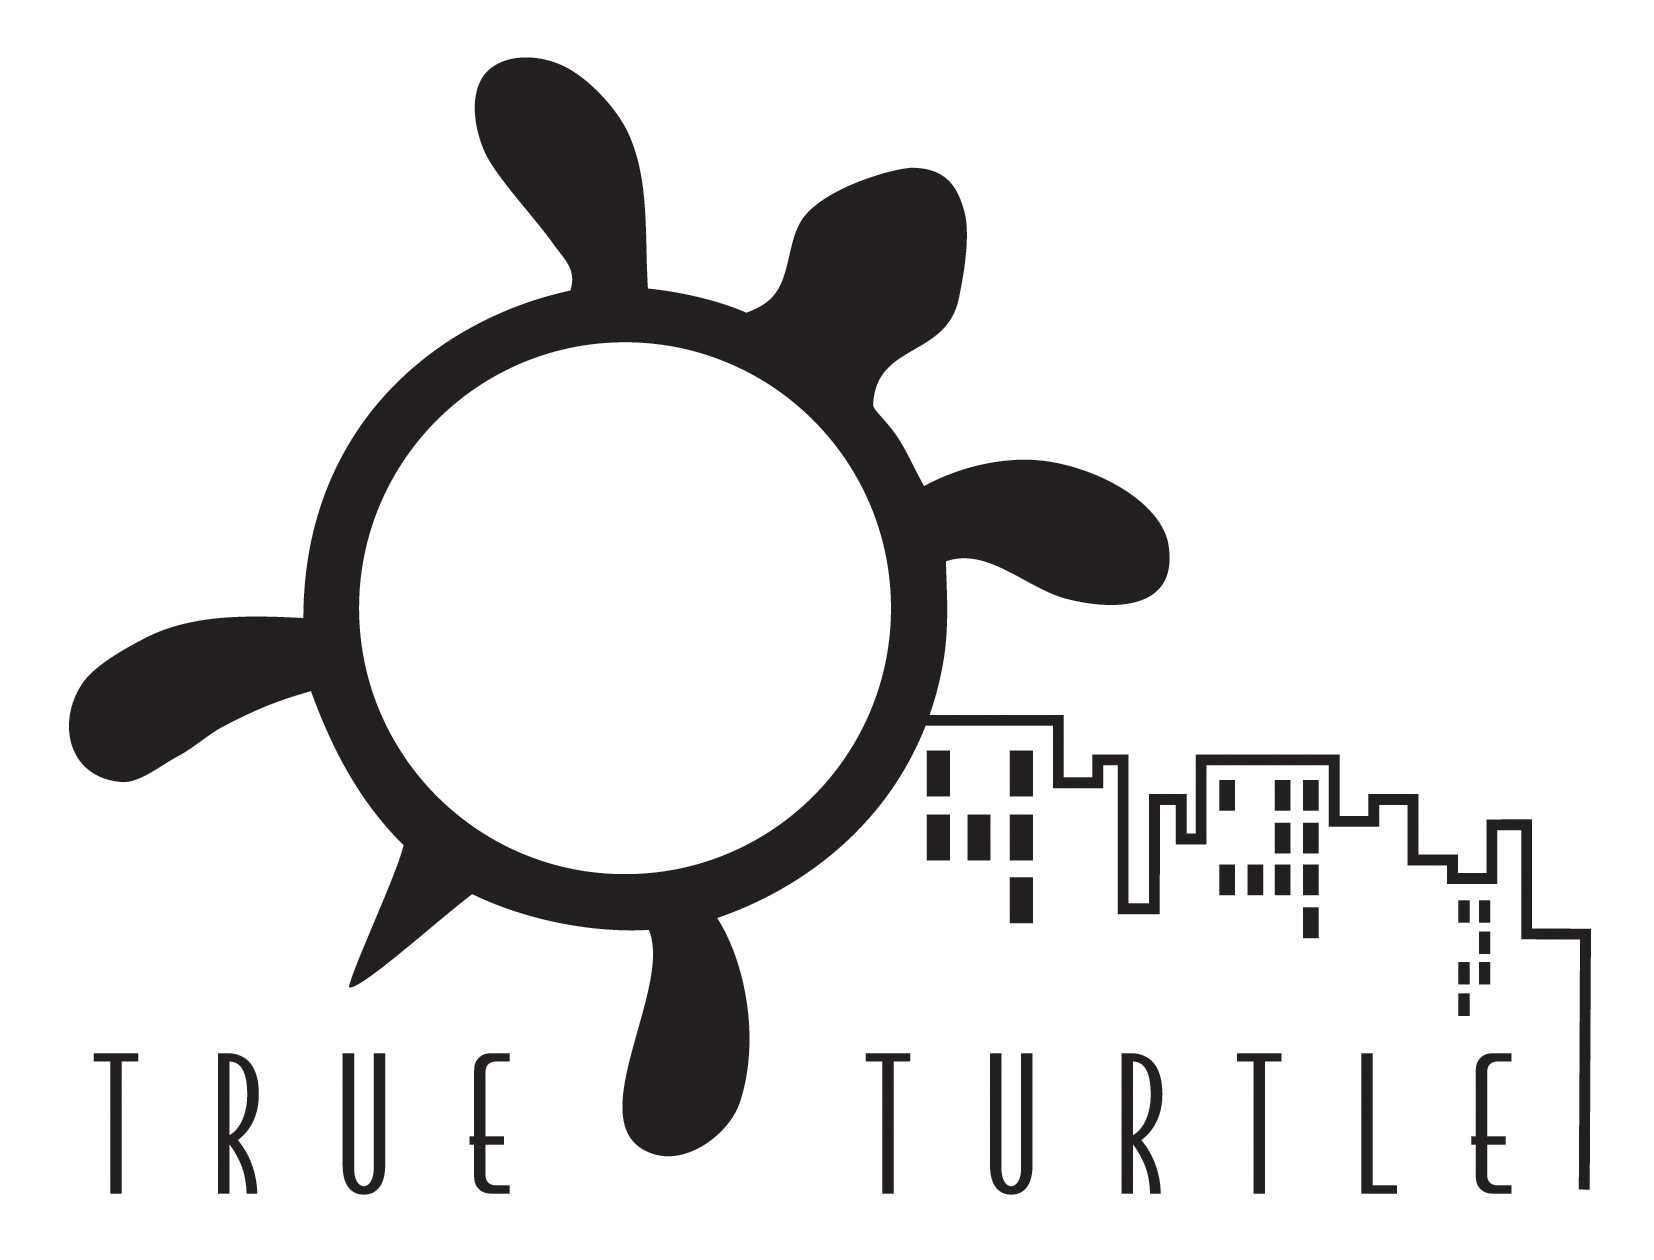 TrueTurtle logo bw-final_1.jpg